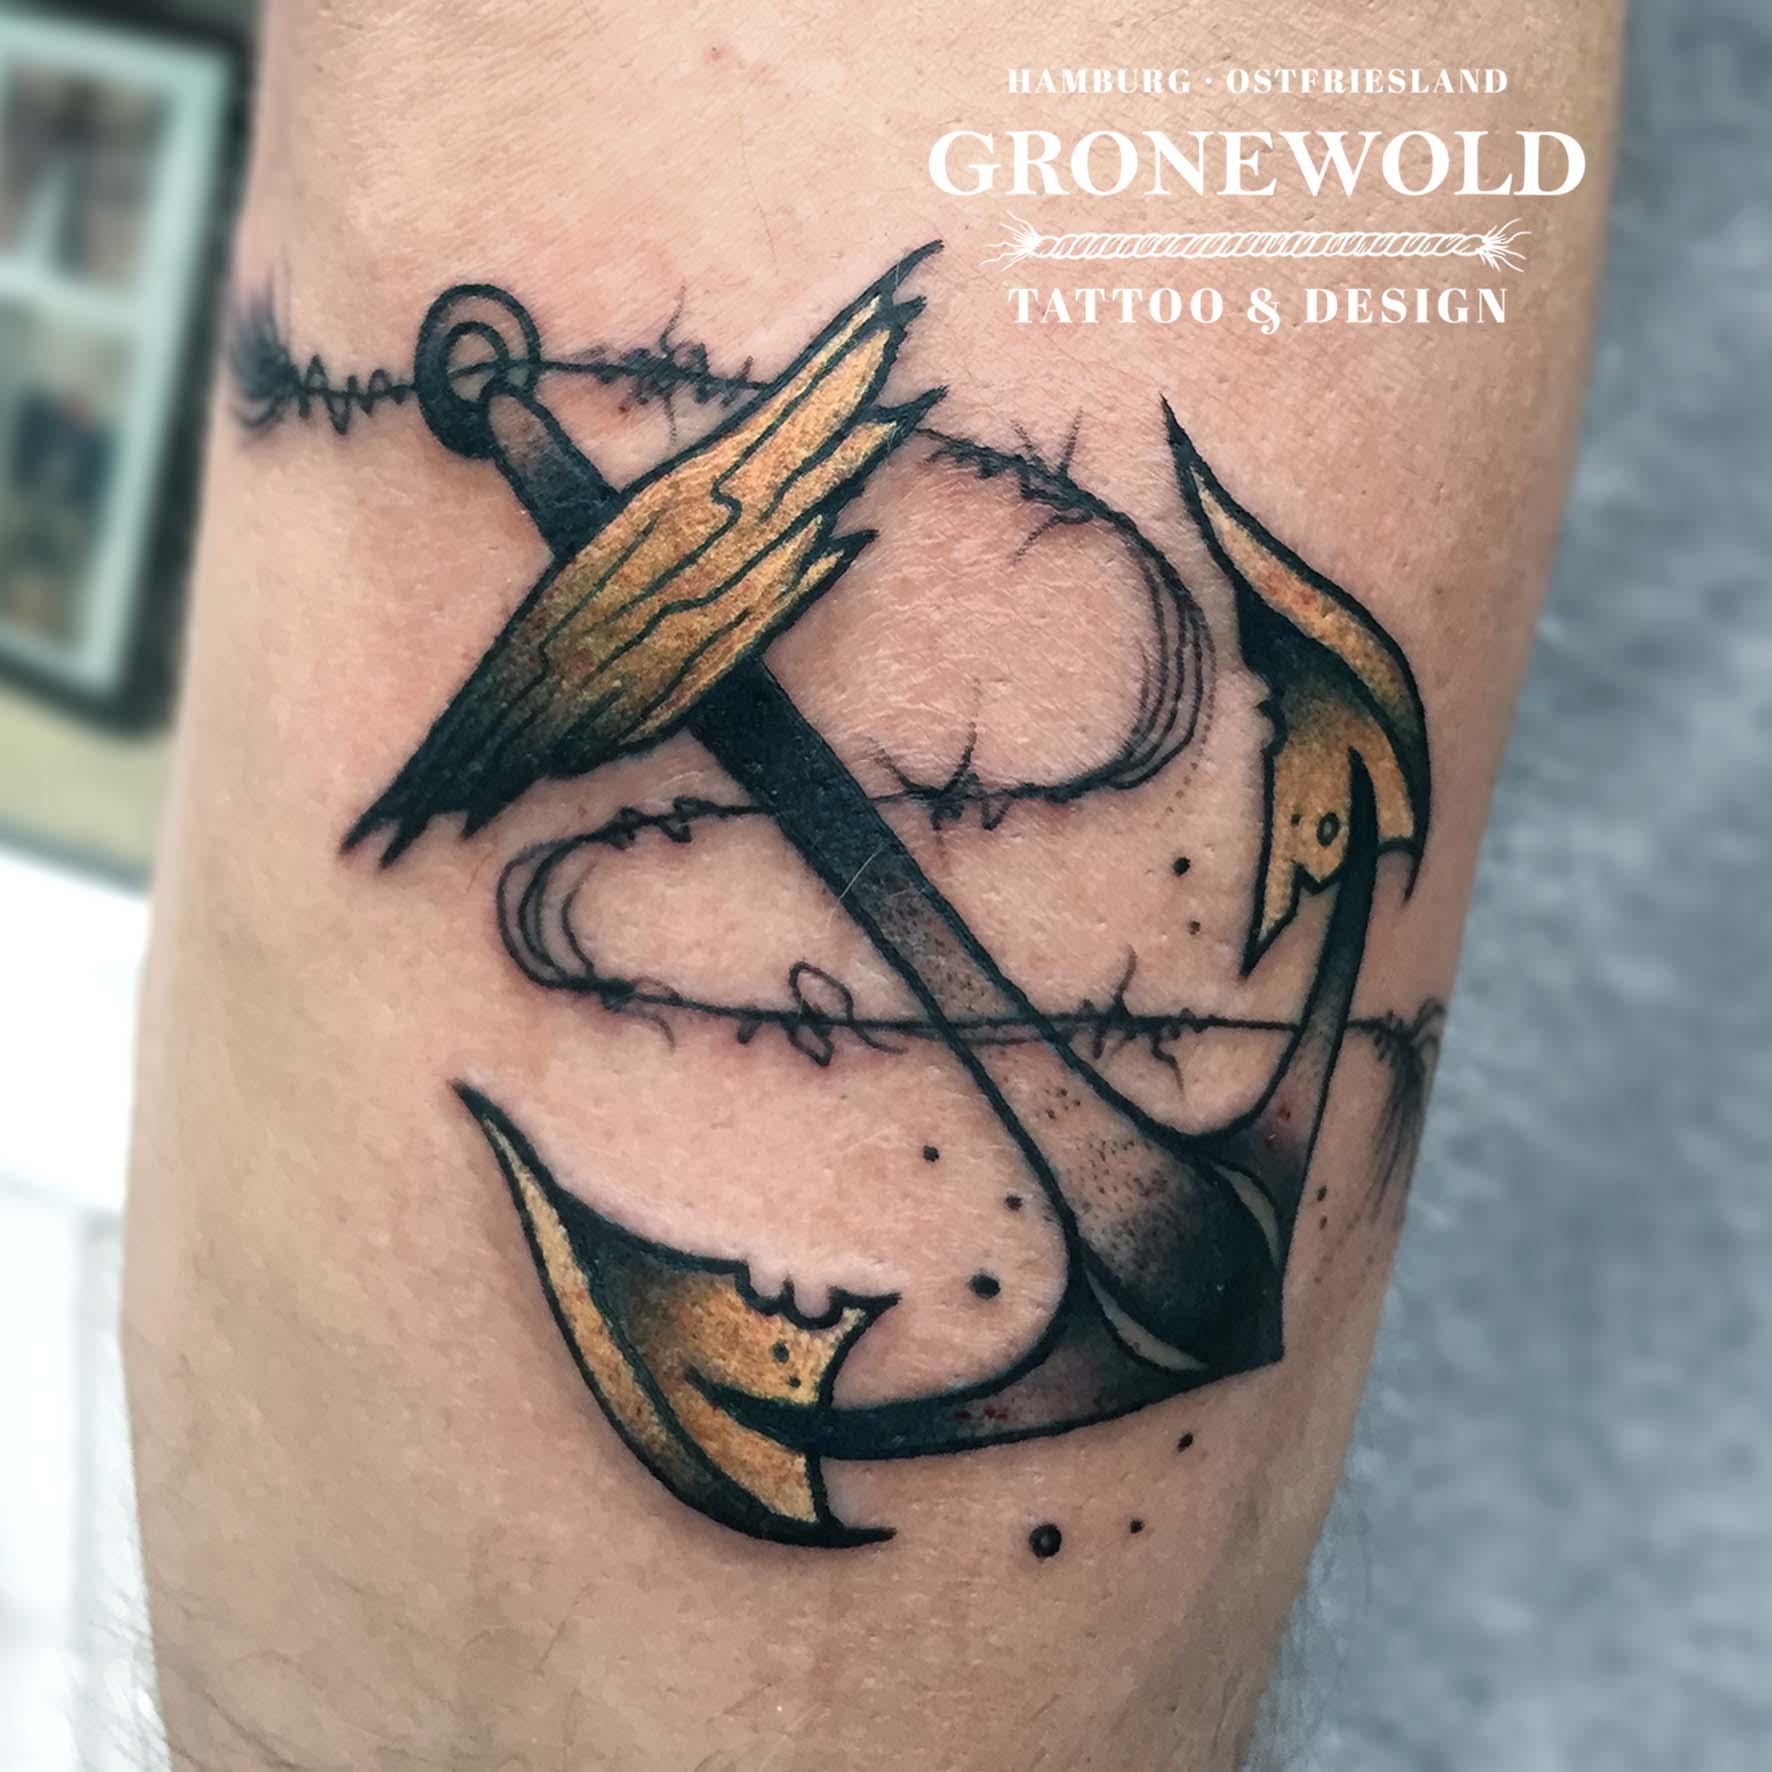 tattoo artists gronewold tattoo design. Black Bedroom Furniture Sets. Home Design Ideas